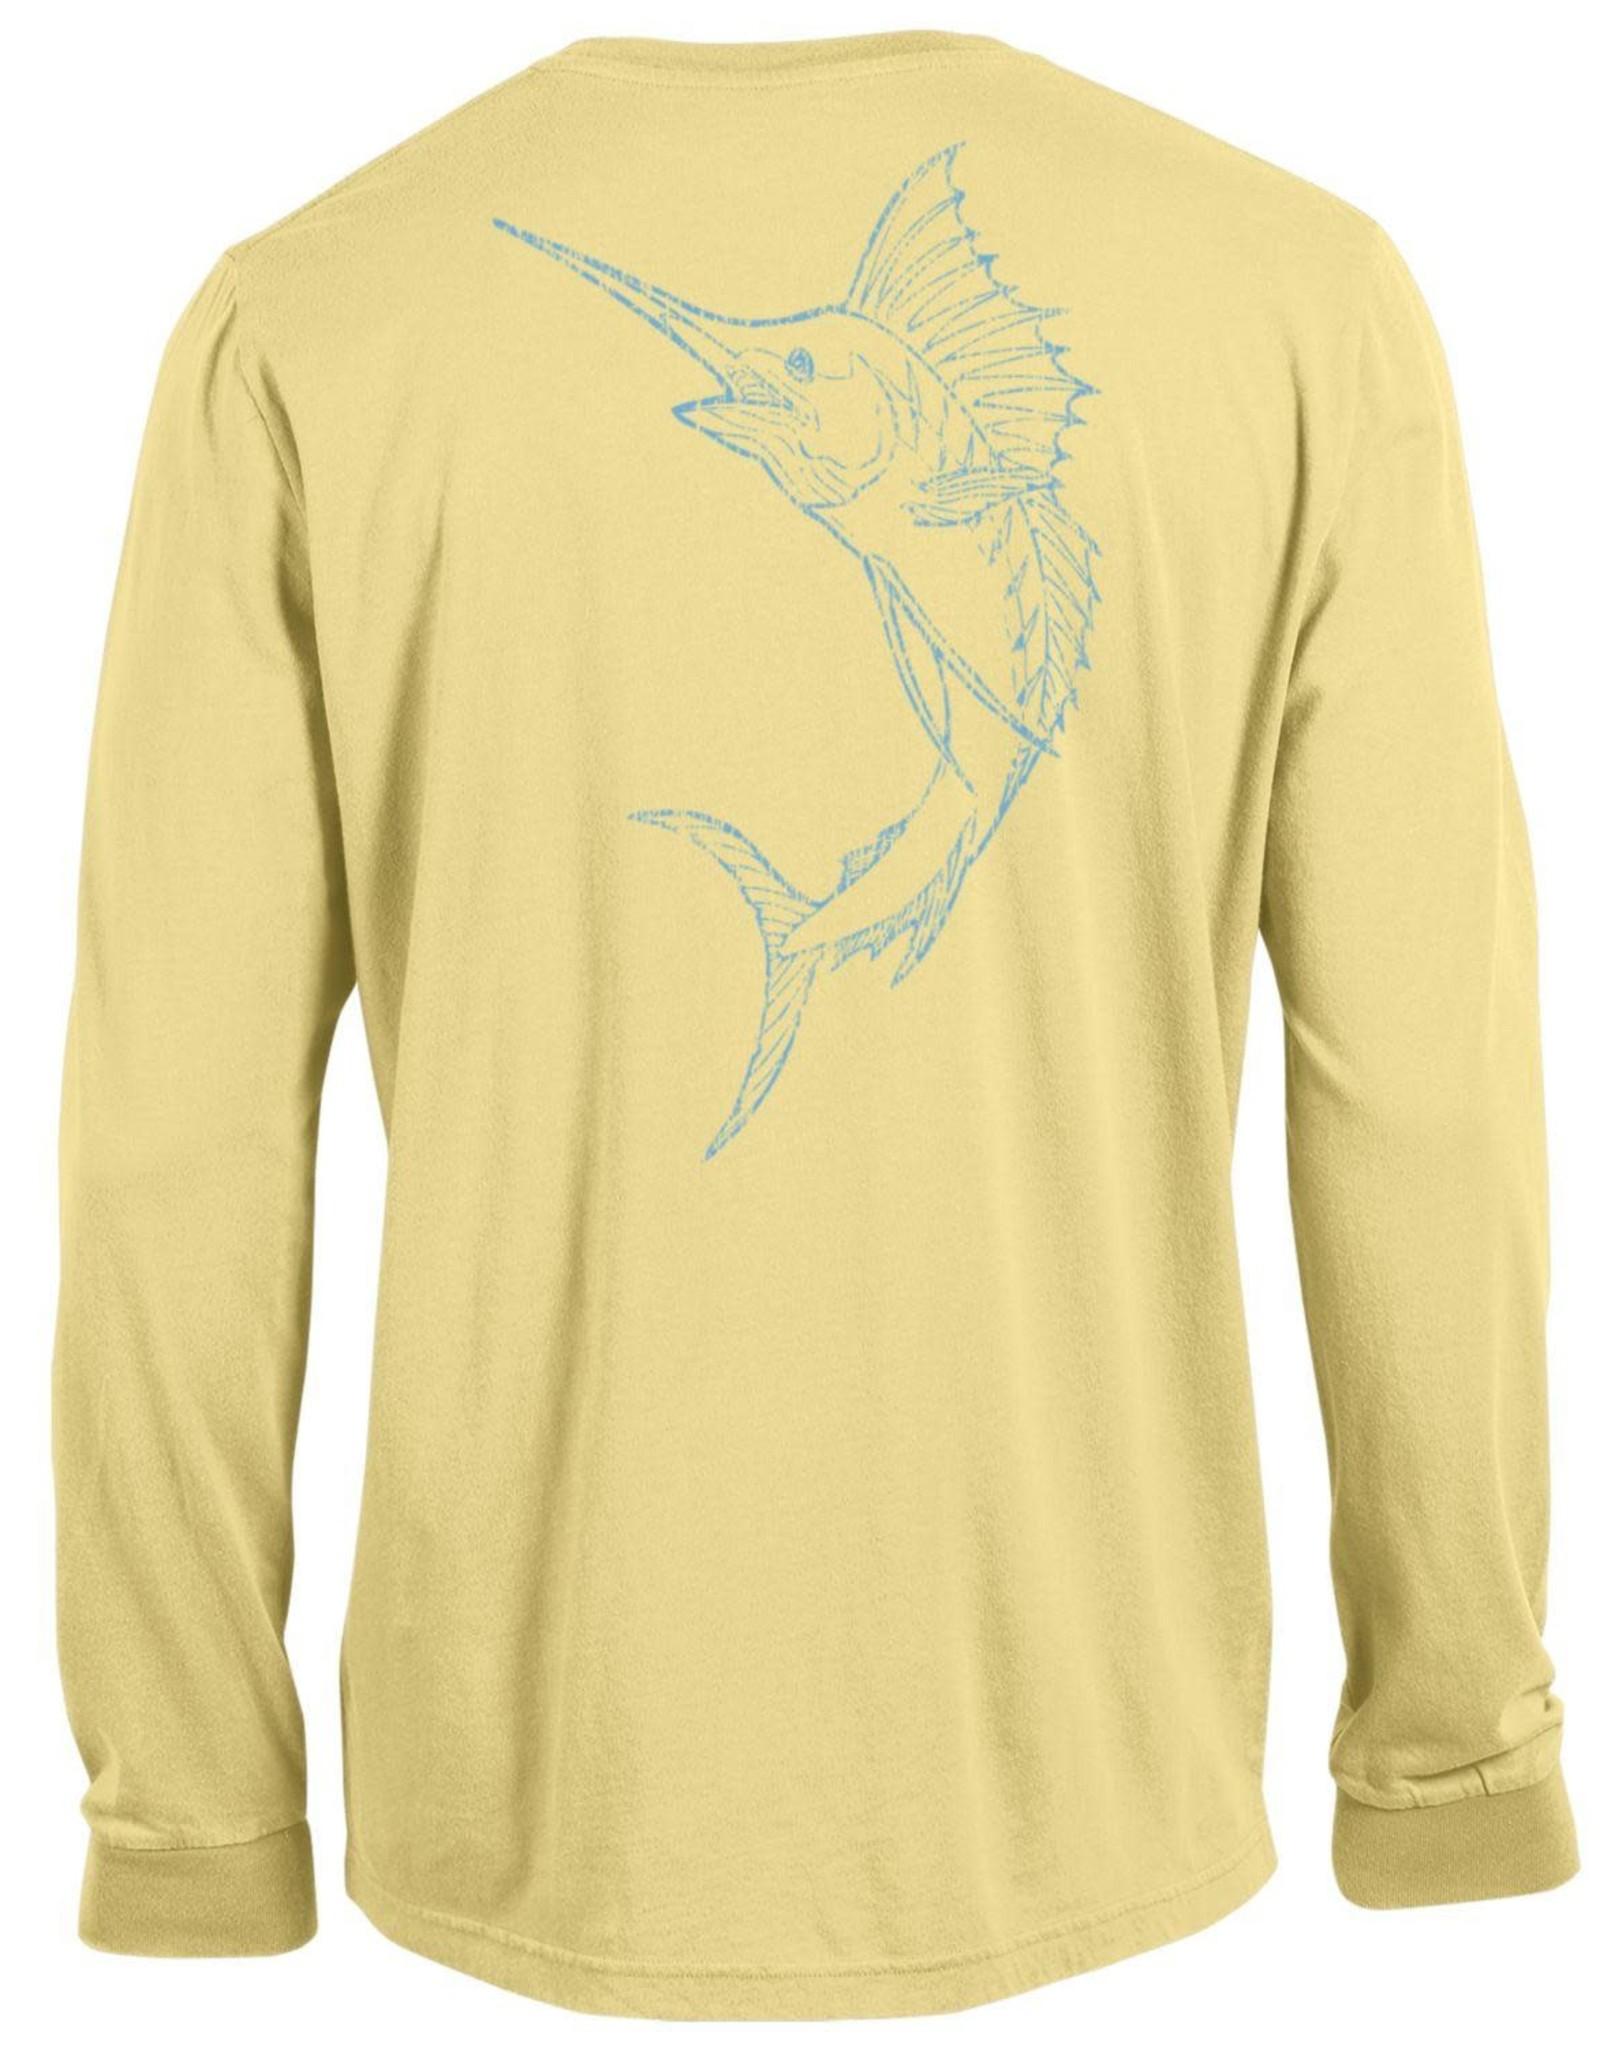 Outta Town Outta Town Unisex Long Sleeve Swordfish